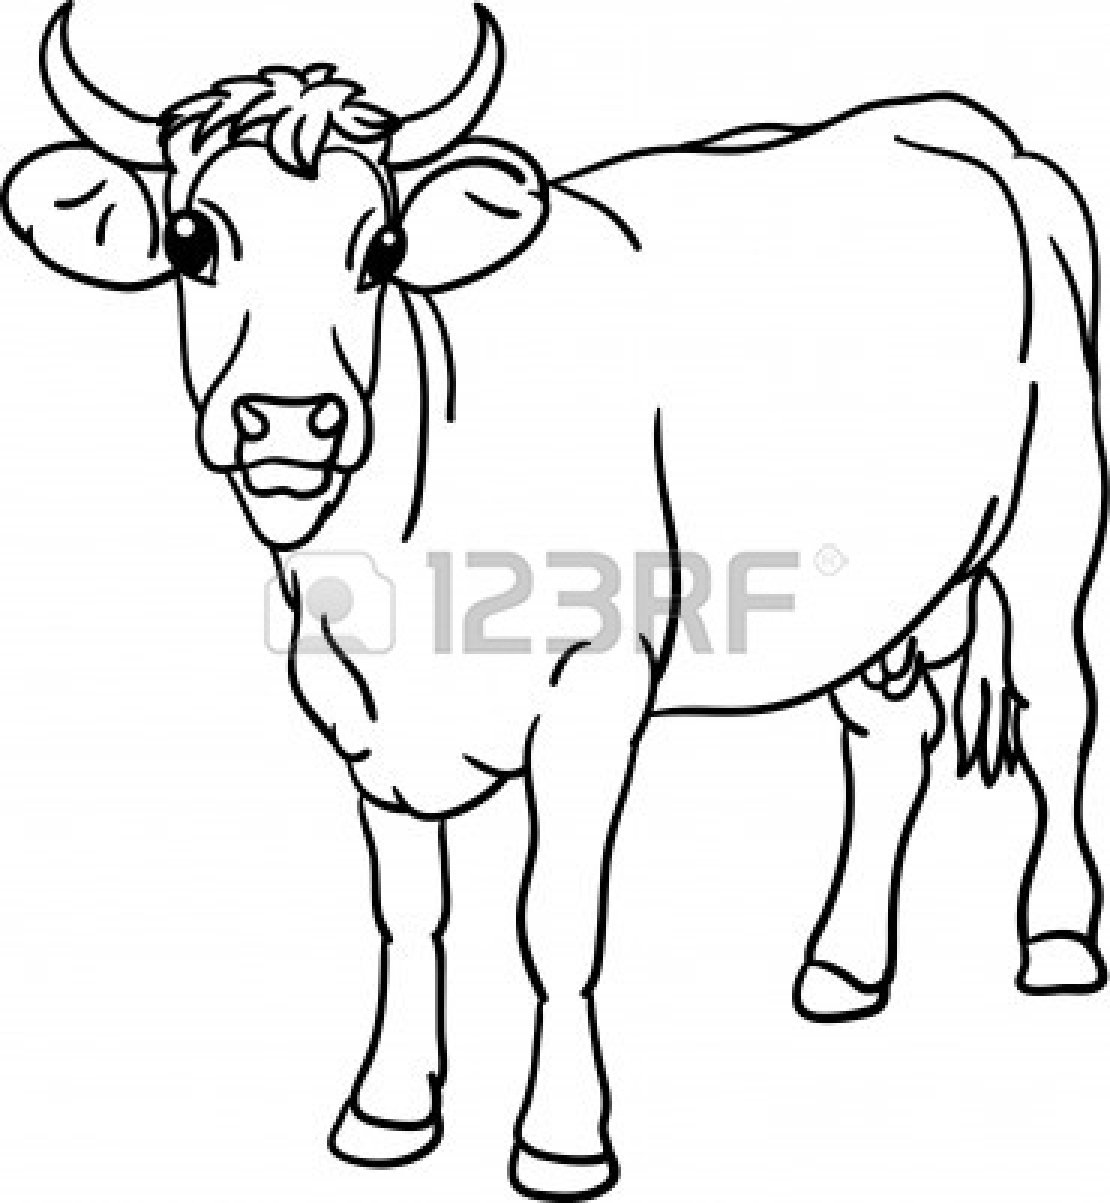 1110x1203 Similiar Cow Head Outline Drawing Keywords Silhouette Clip Art